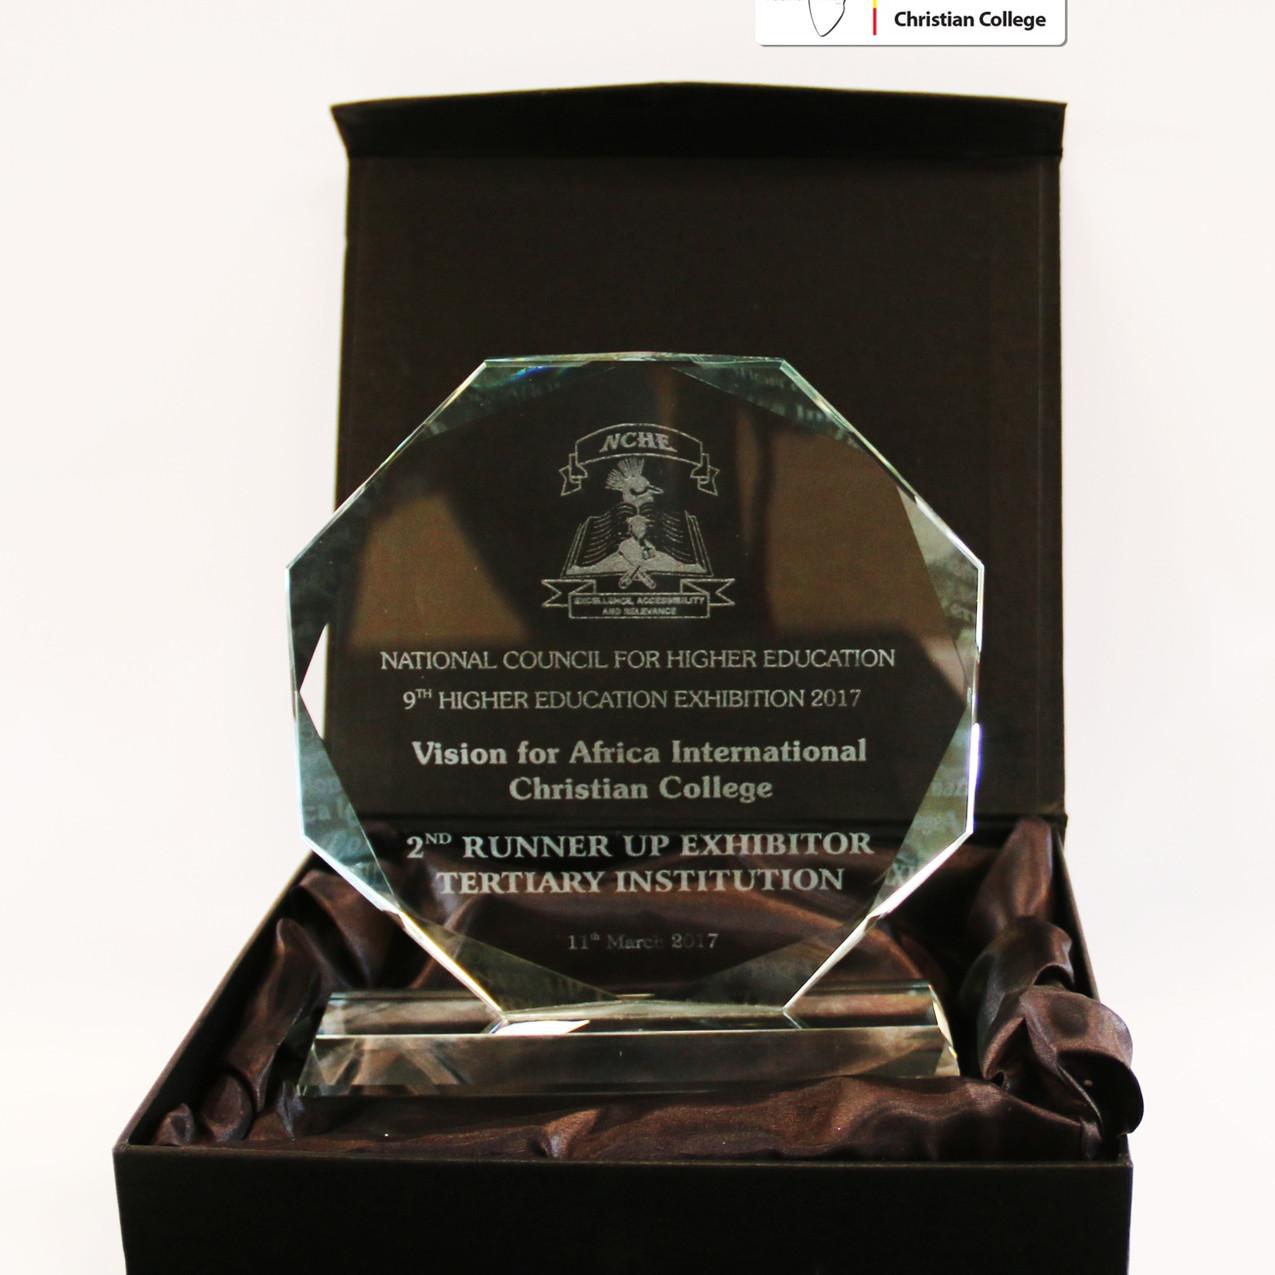 2. Platz Glas Award